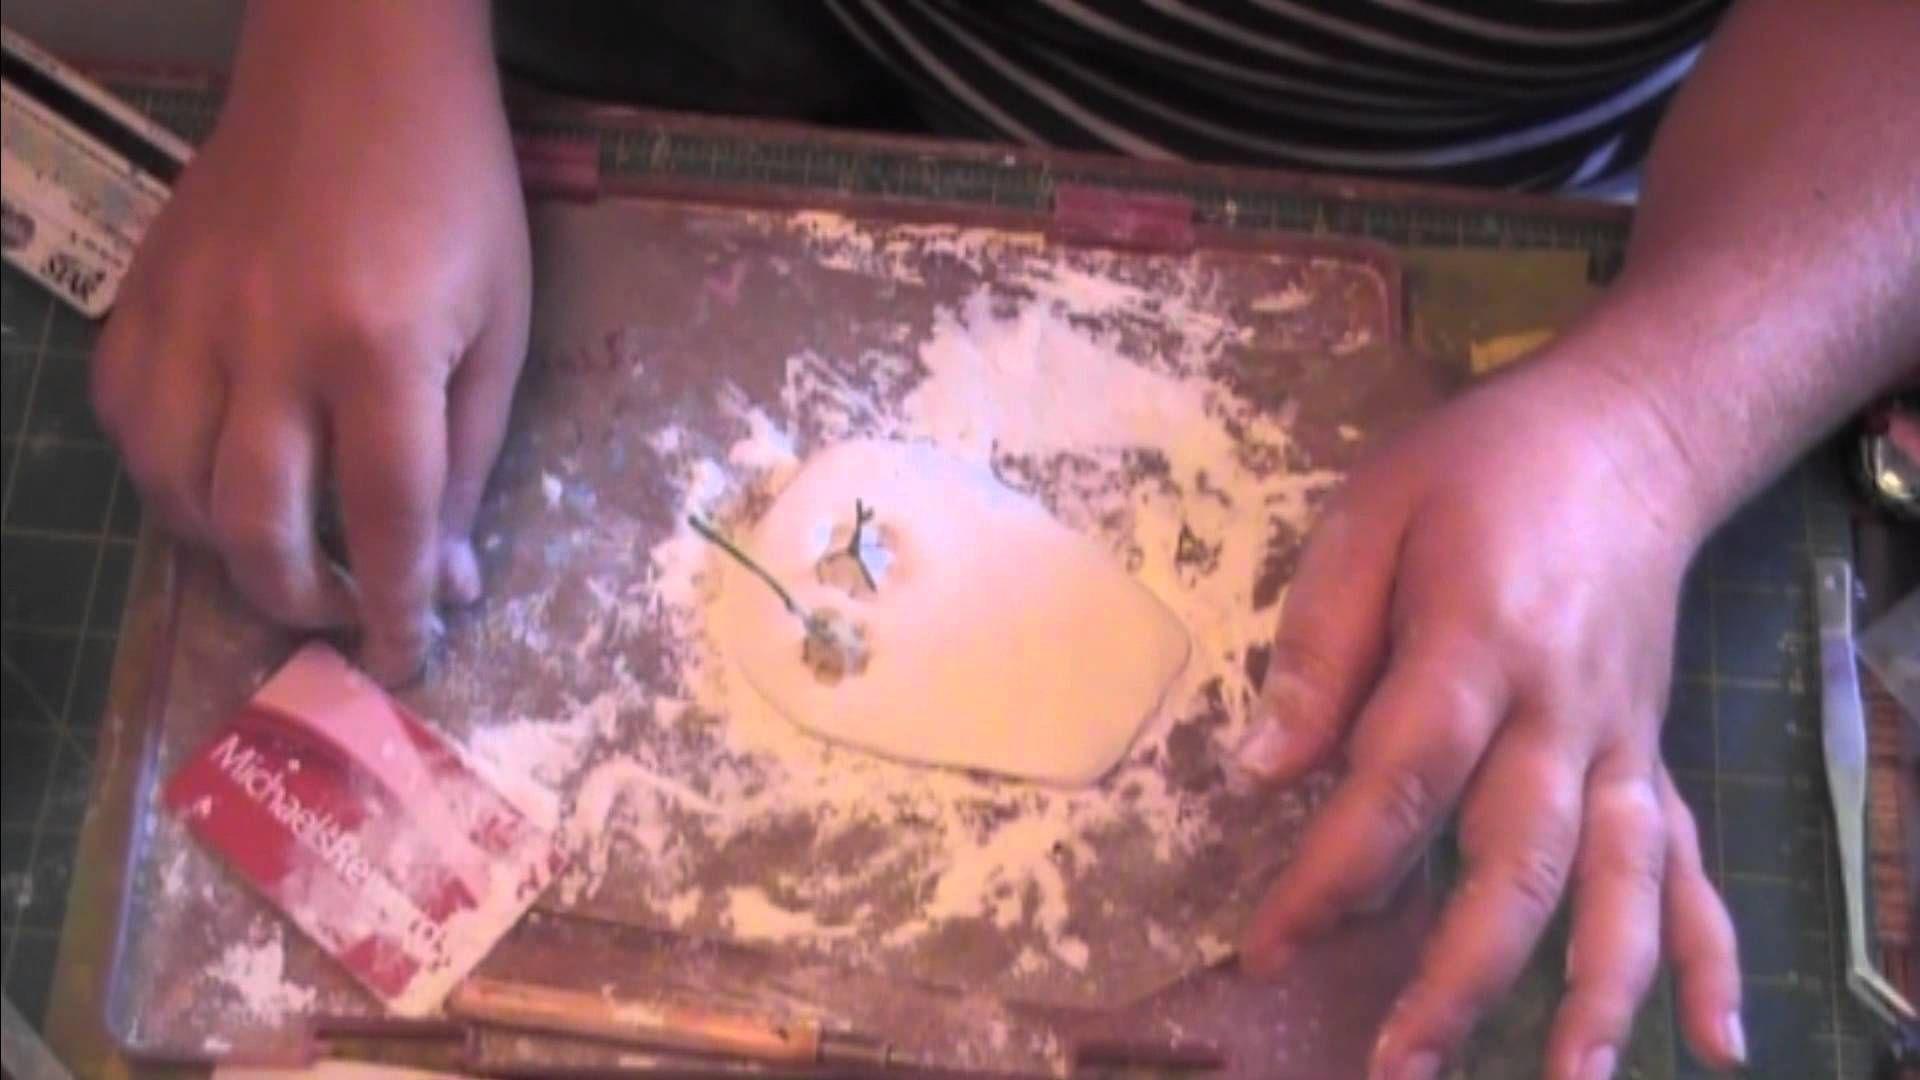 Economical Silicone Molding tutorial, via YouTube